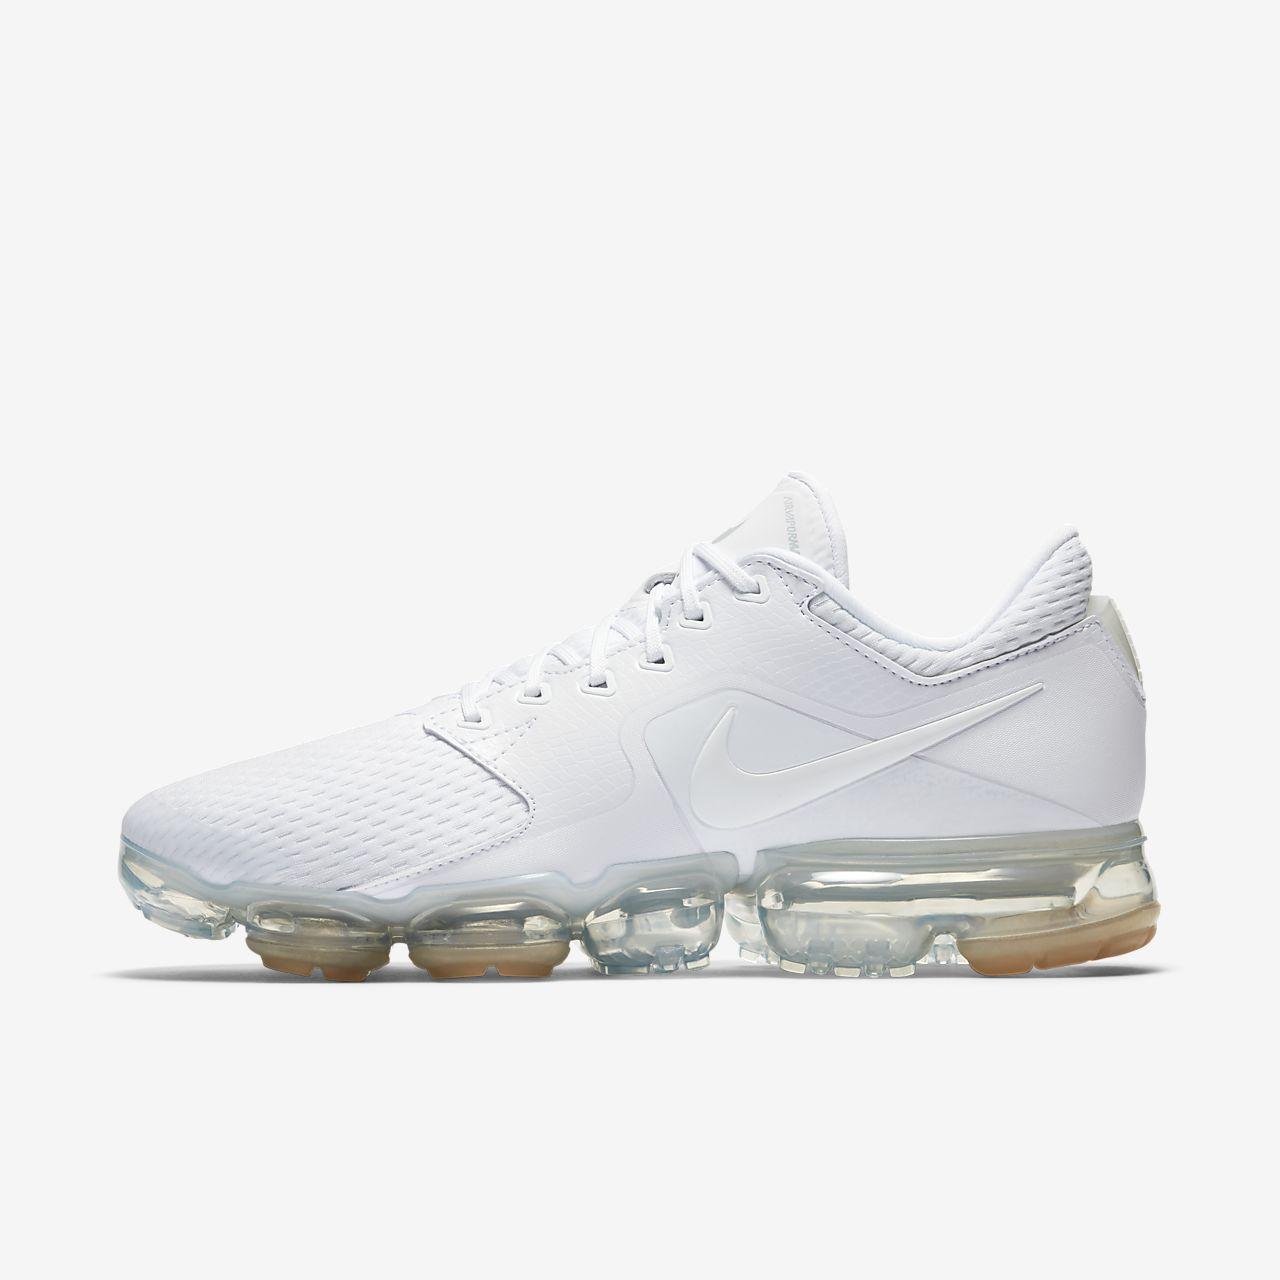 390ab26038b Nike Air VaporMax Men s Shoe. Nike.com FI